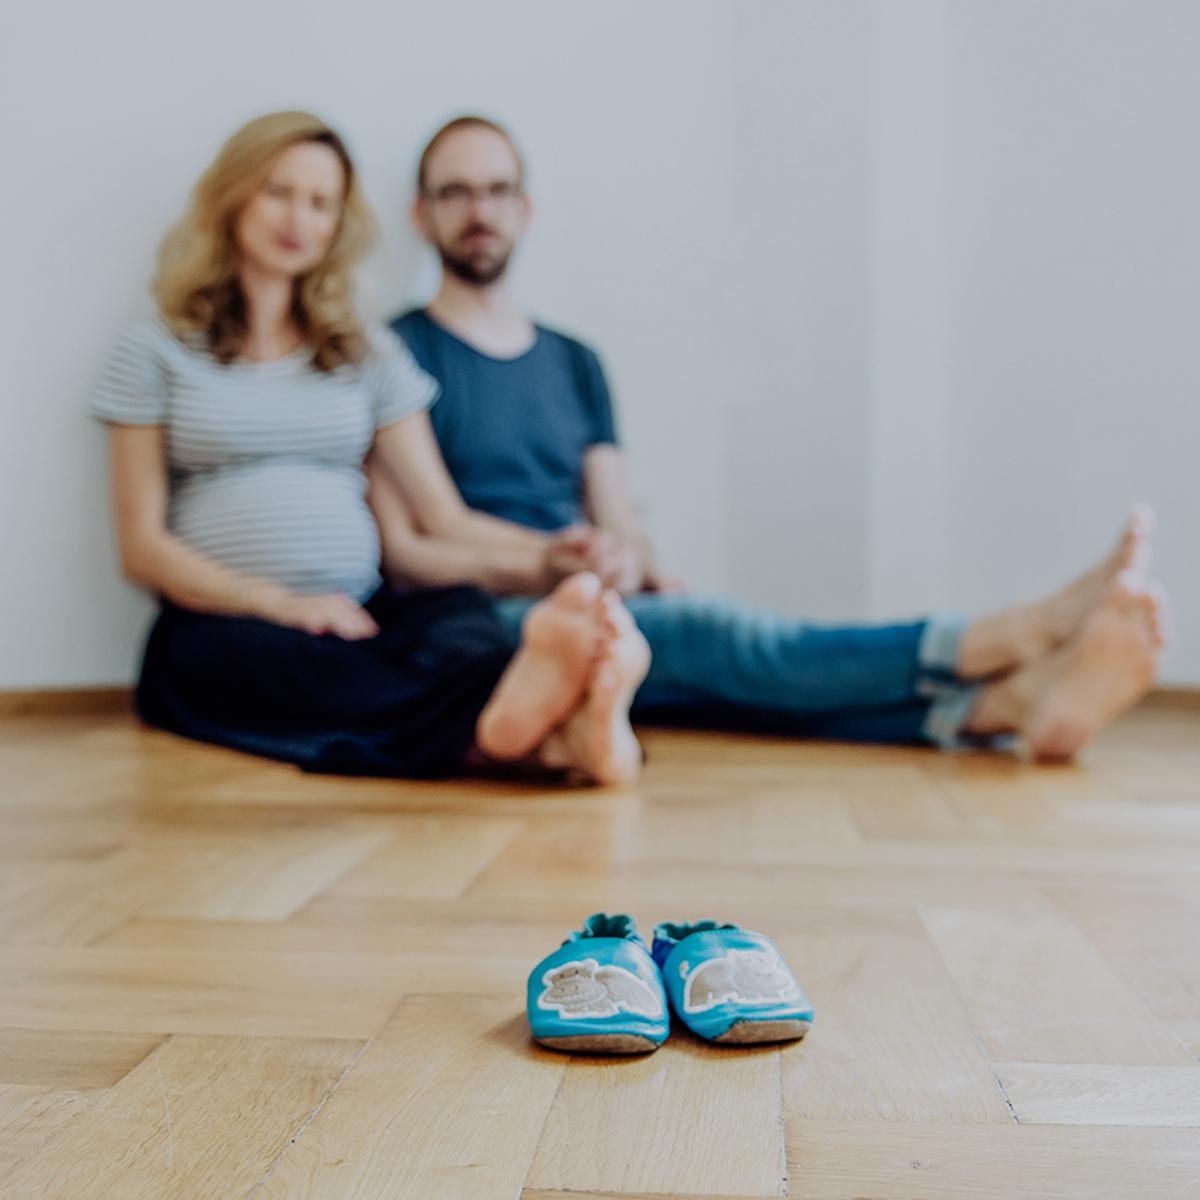 Schwangerschaft_Paar-auf-Boden_Babyschuhe_quadratisch